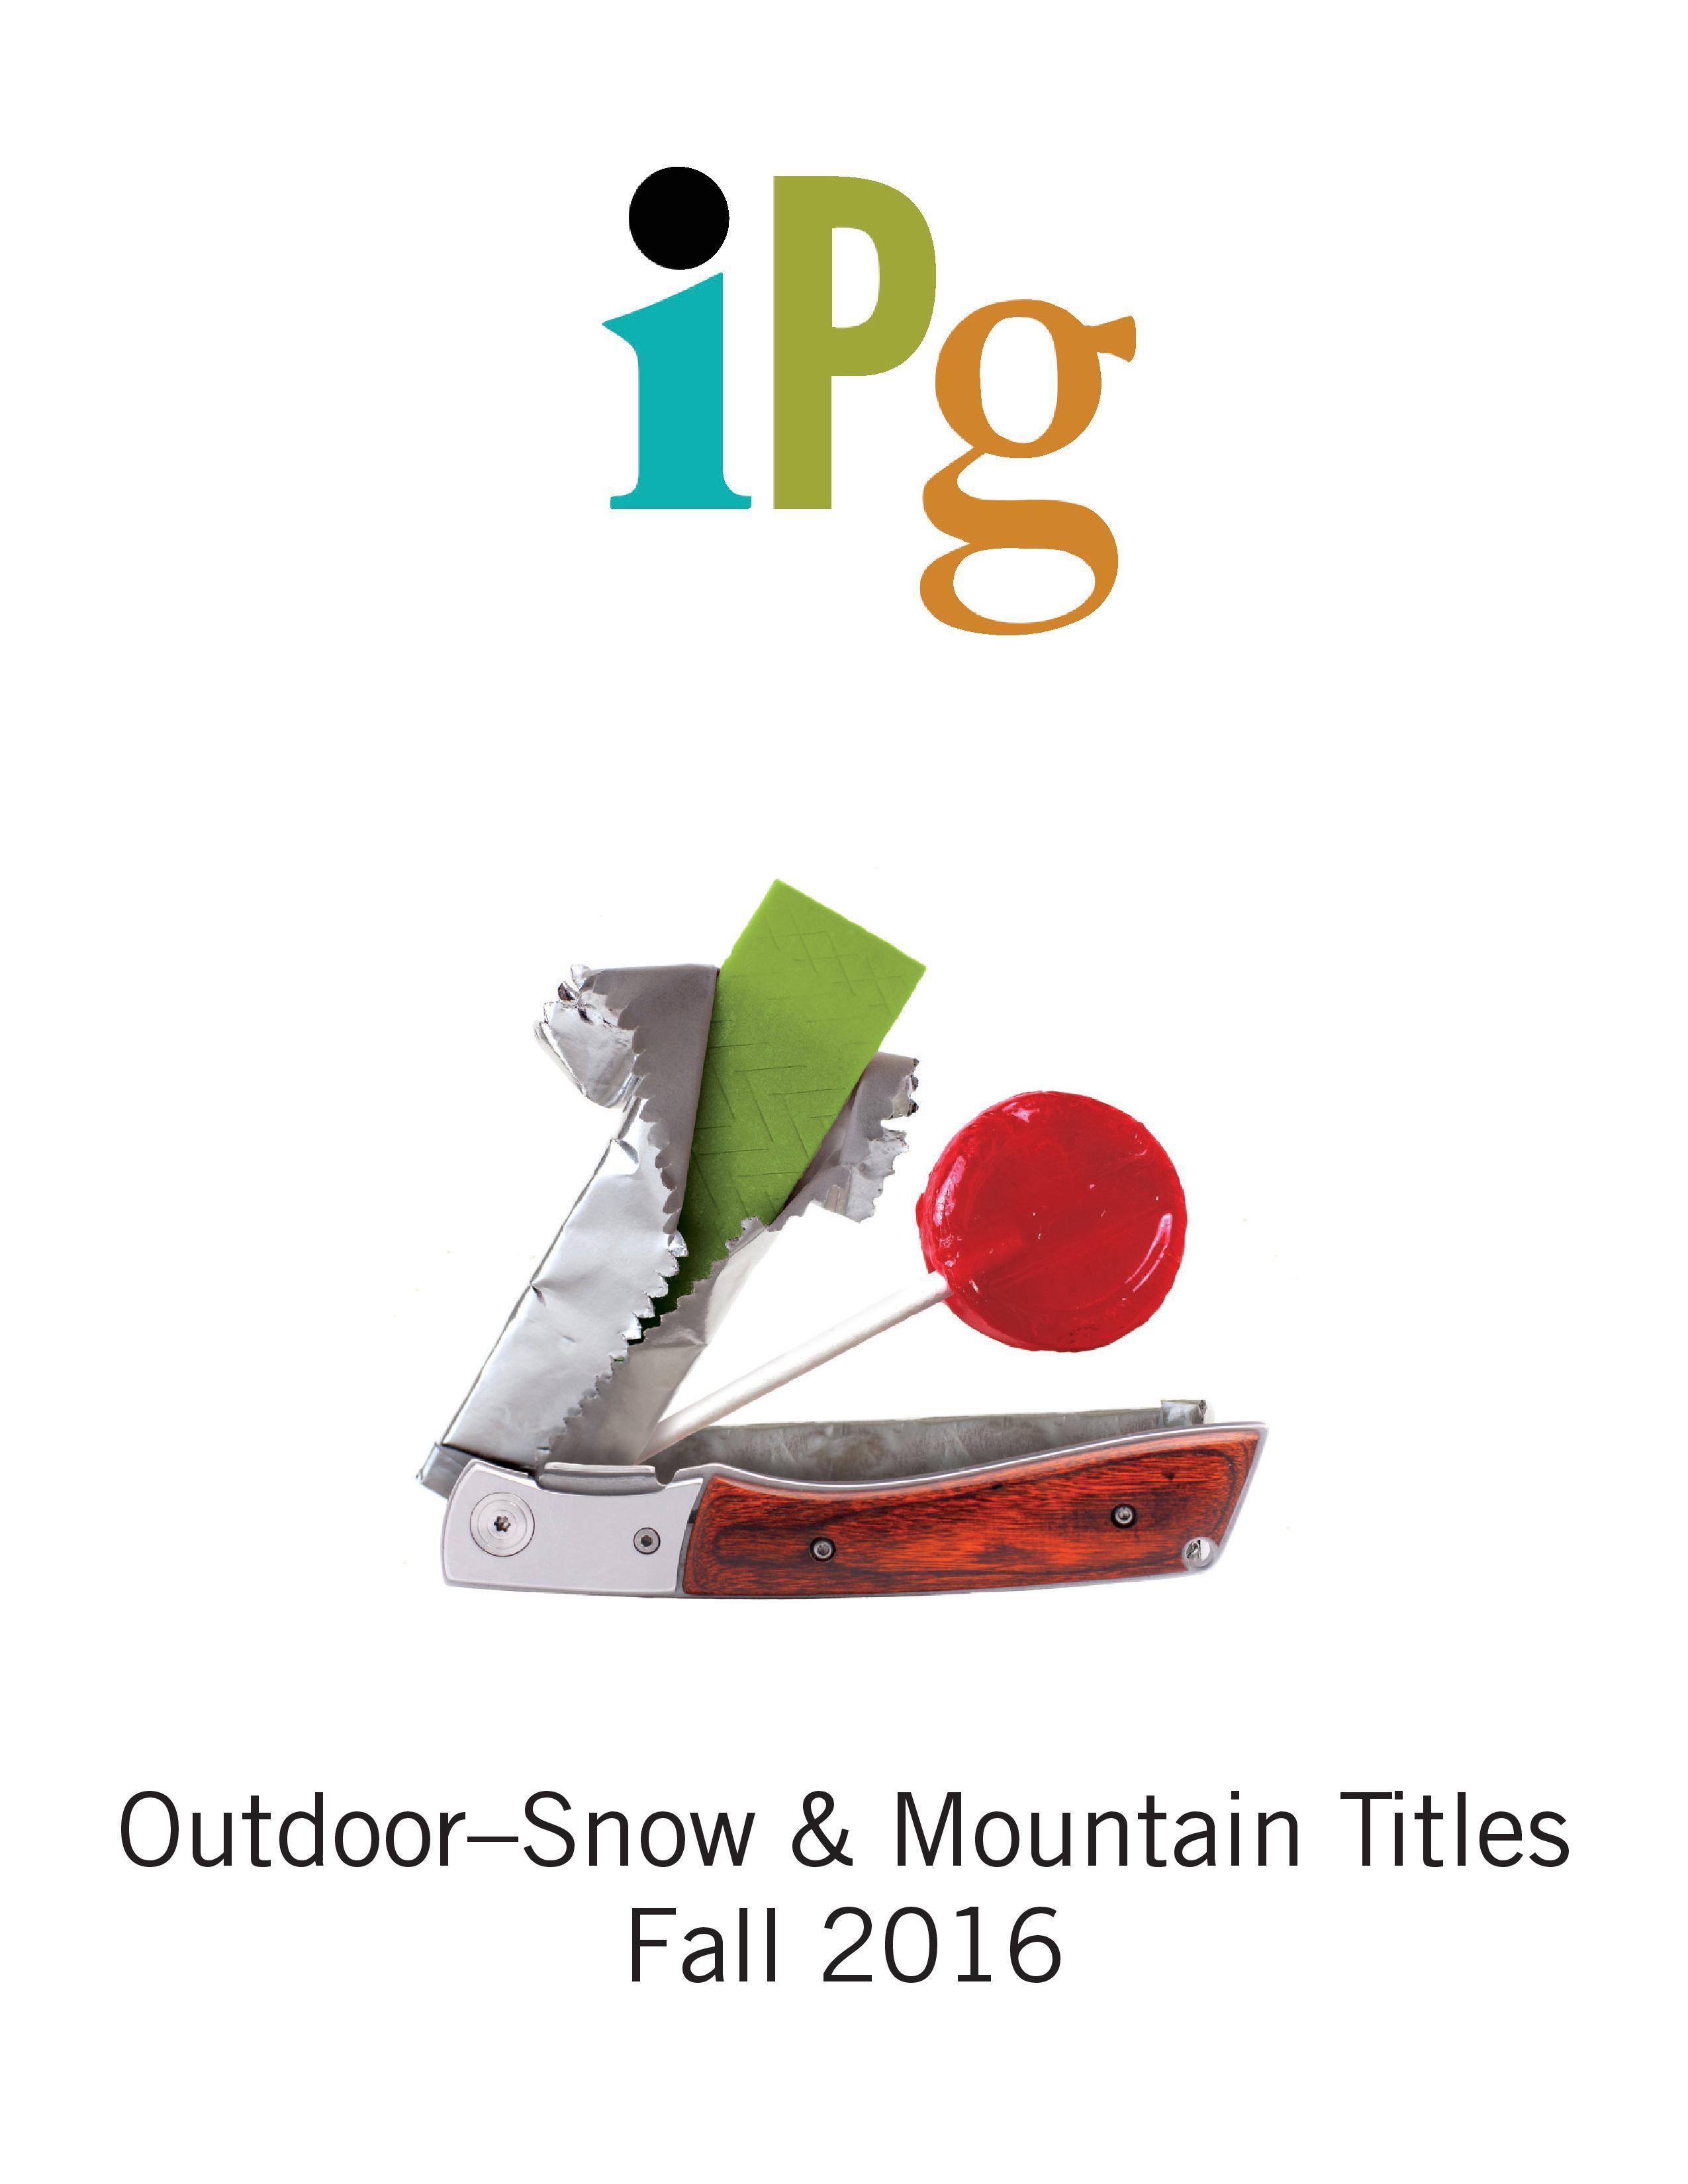 Outdoor - Snow & Mountain Titles